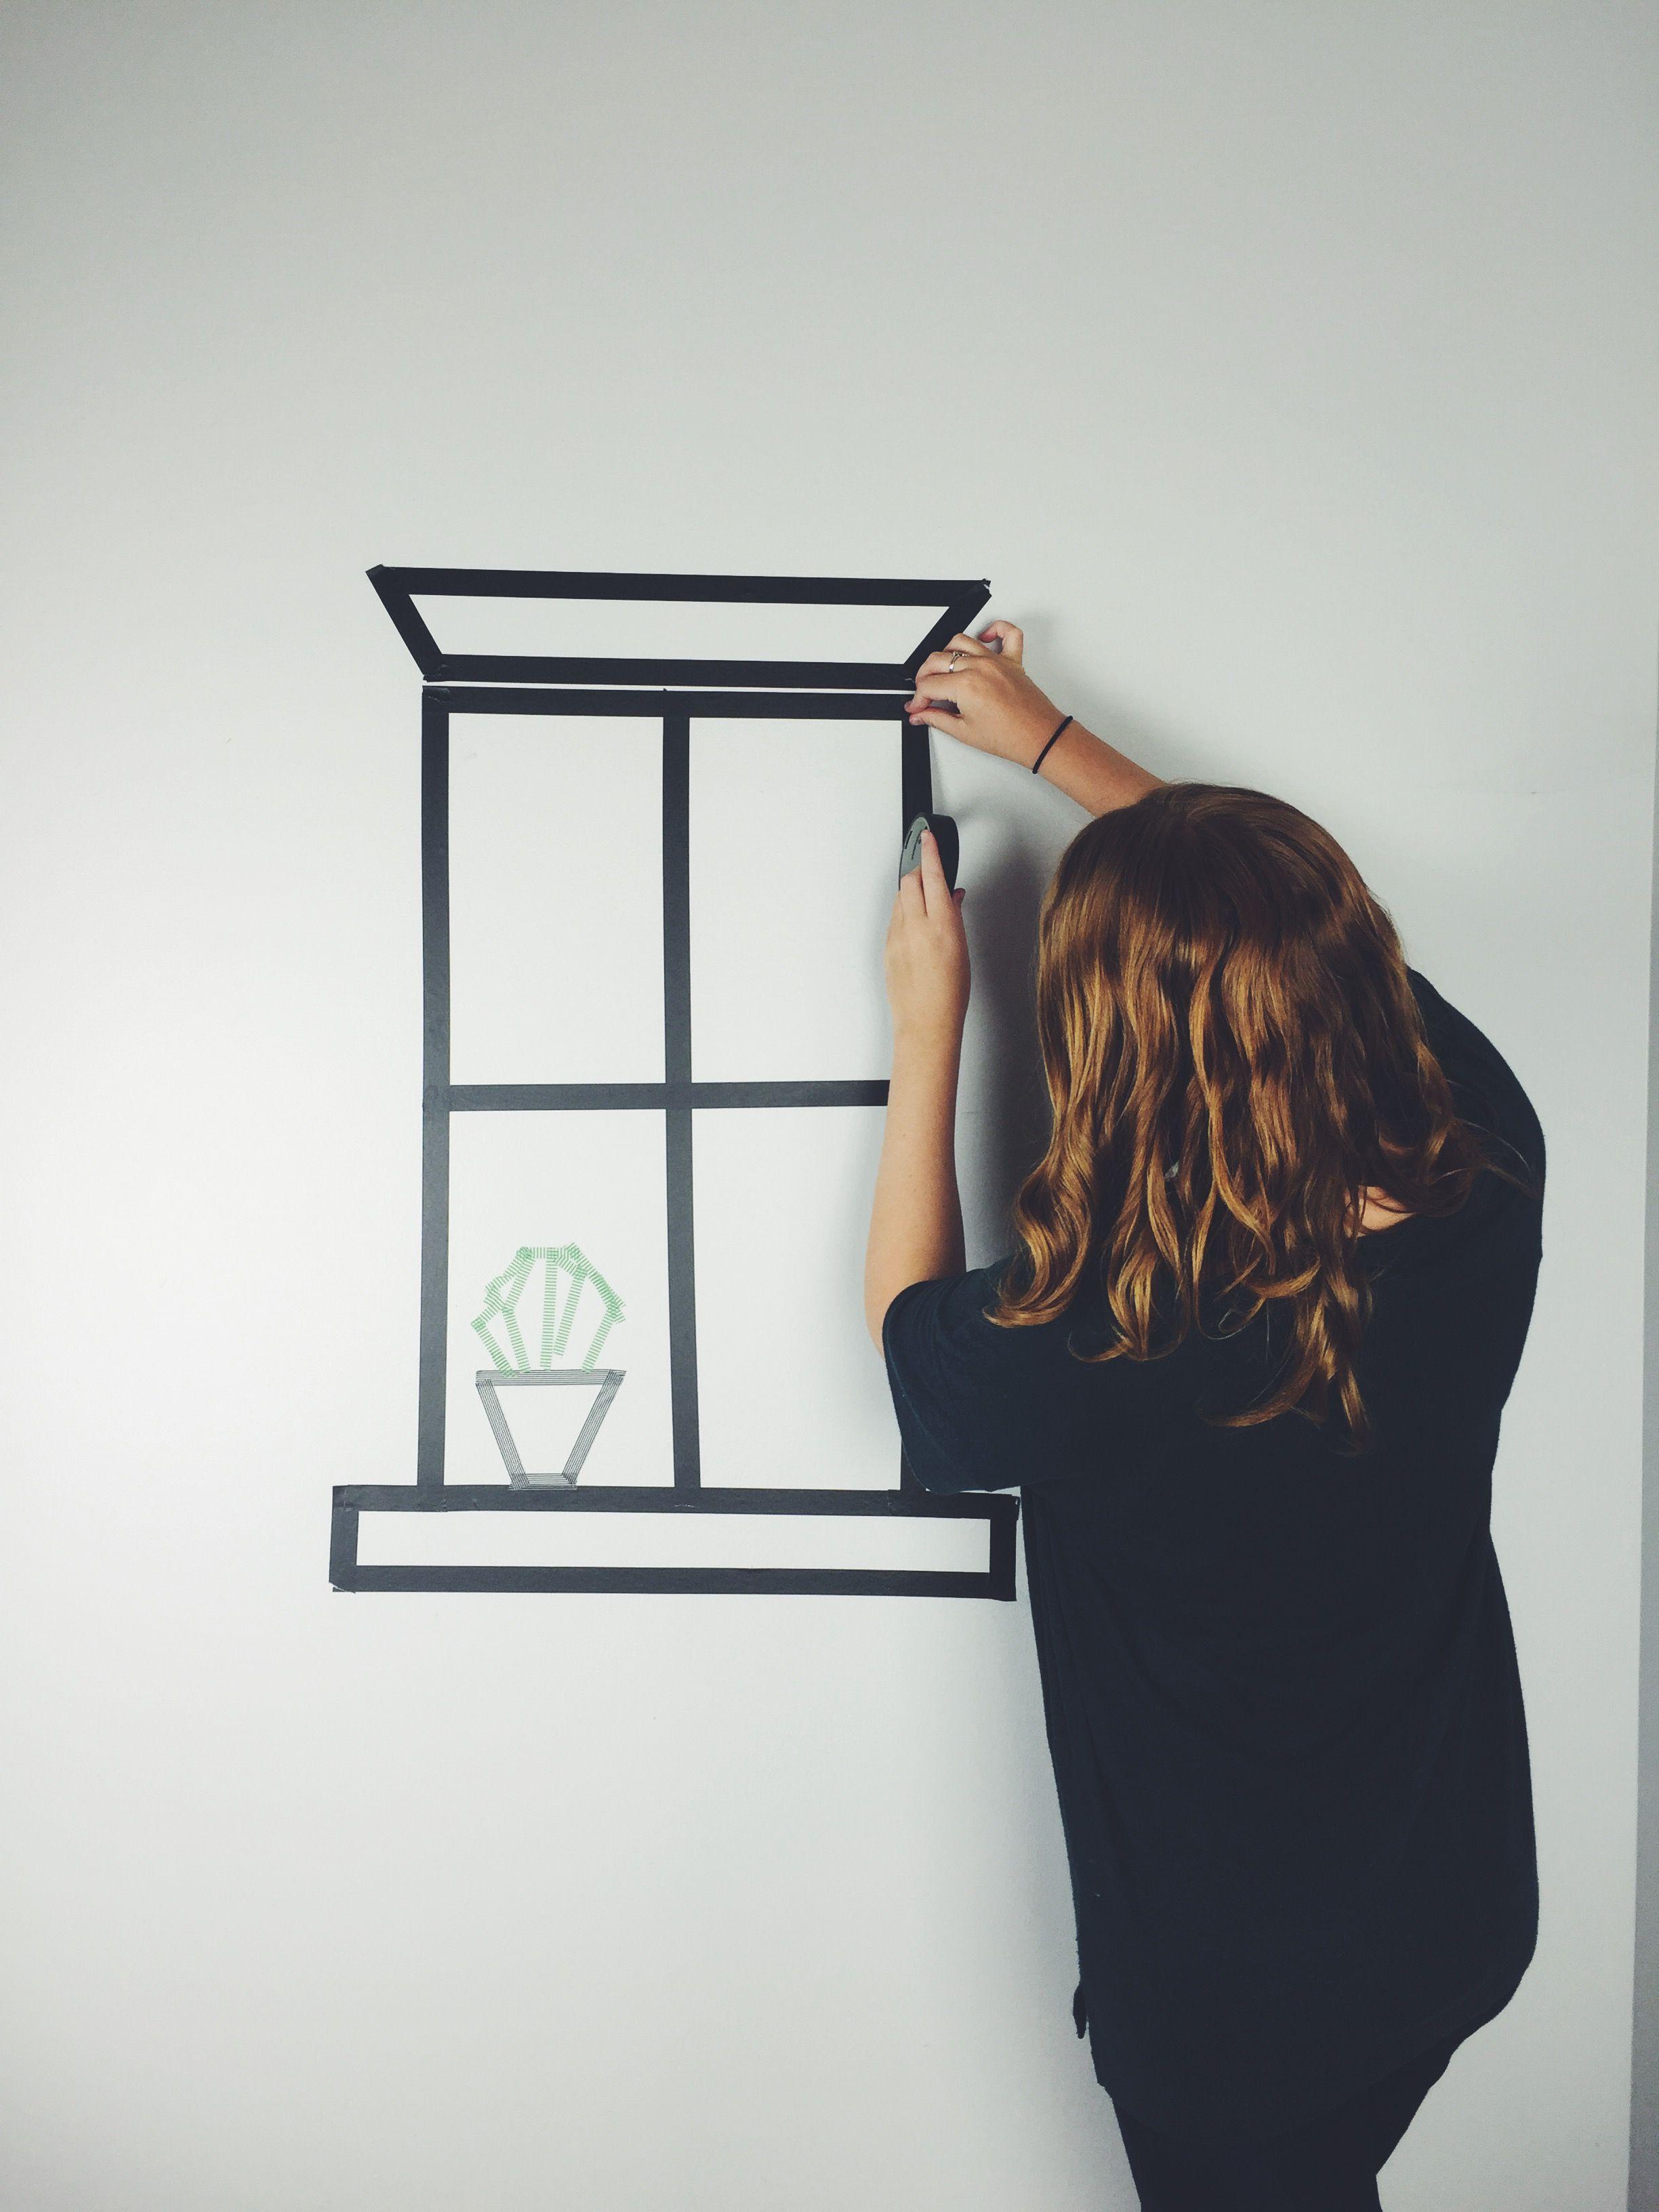 Dorm Wall Art: Washi Tape Windows | Tape wall art, Washi tape wall ...